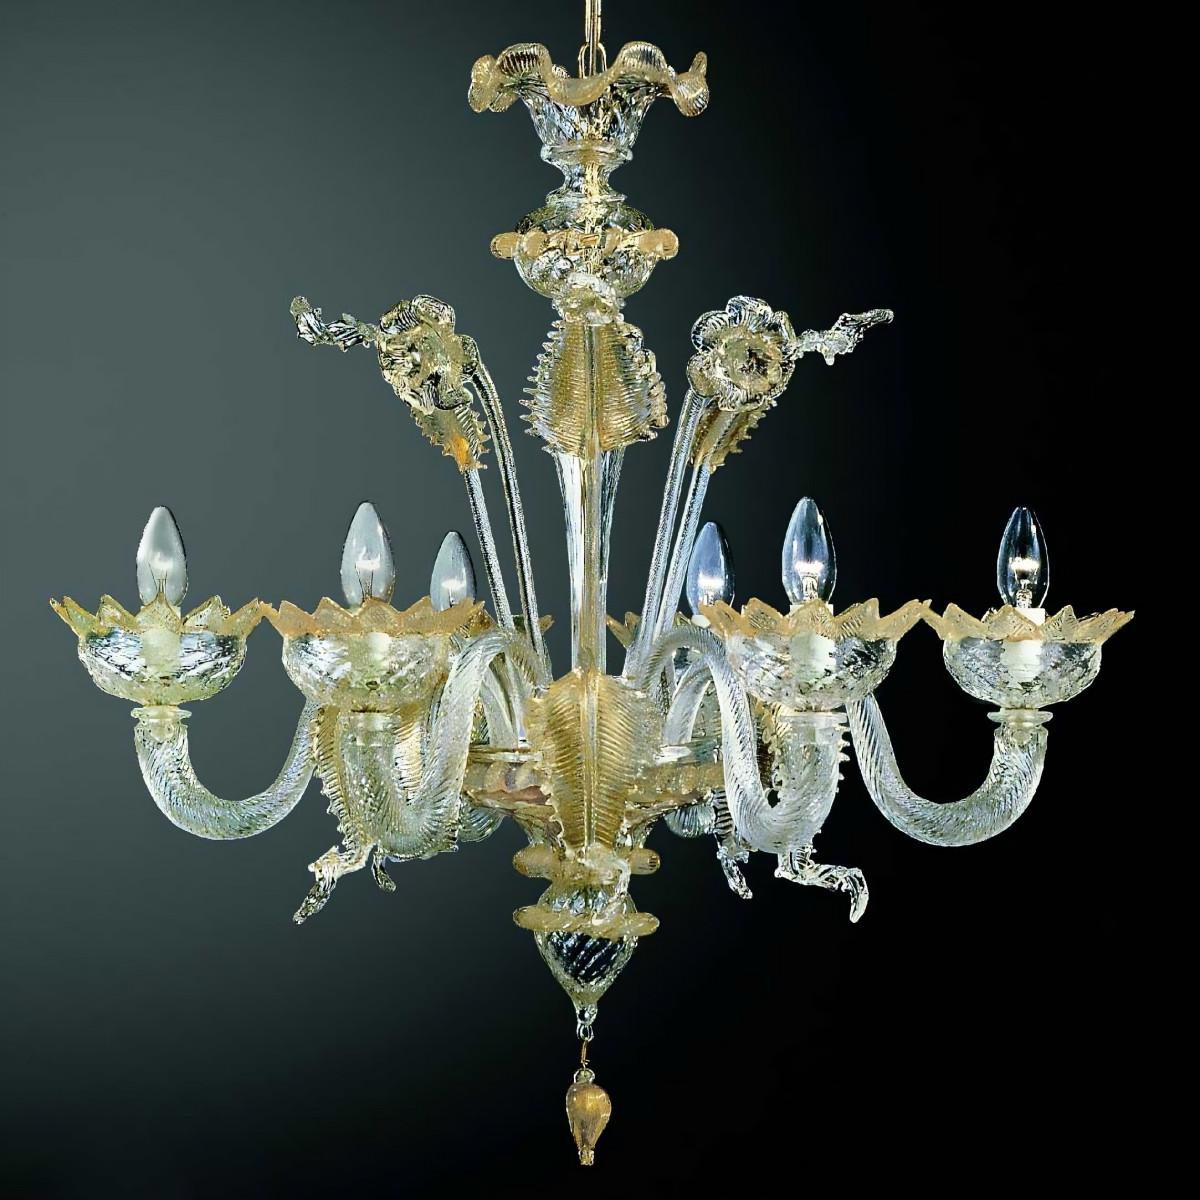 Casanova 6 luces lampara de Murano color transparente oro